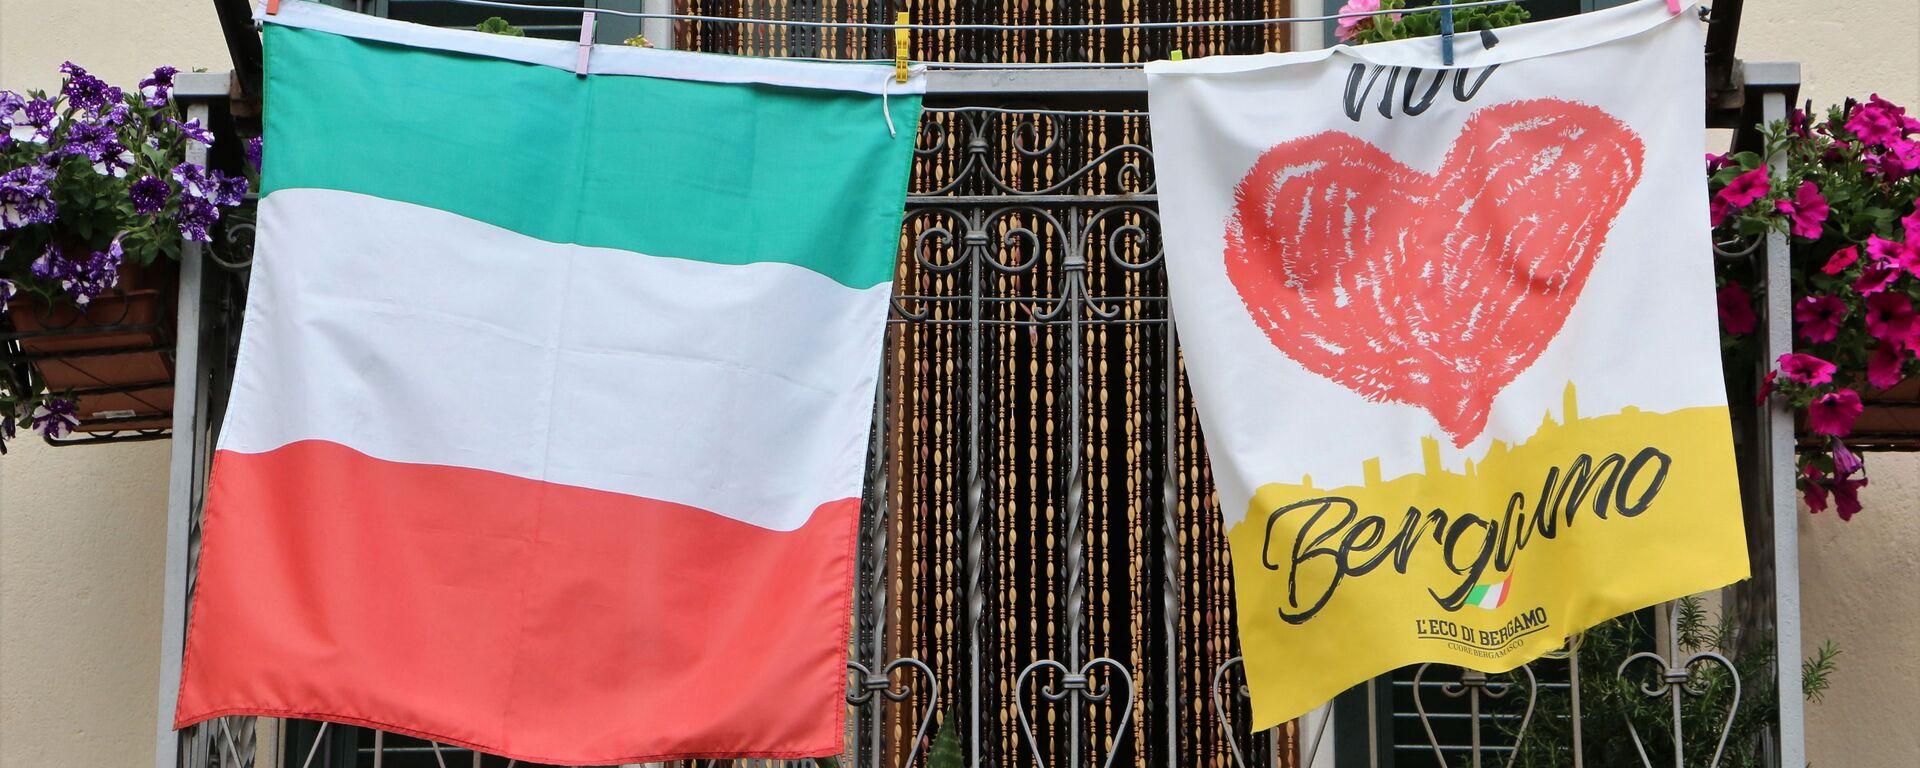 Bandiera italiana a Bergamo - Sputnik Italia, 1920, 03.07.2021